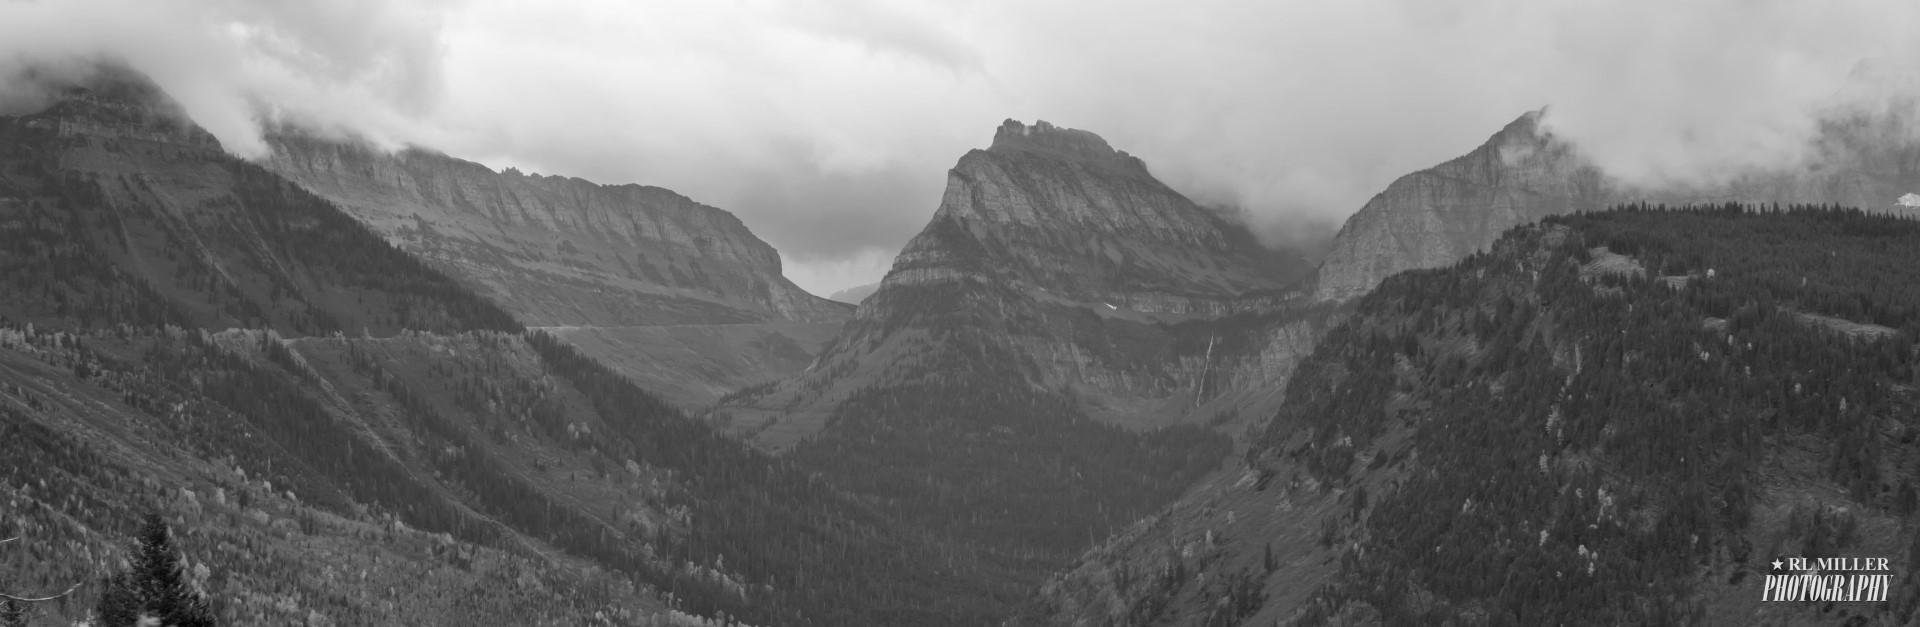 Glacier National Park Mountain Range